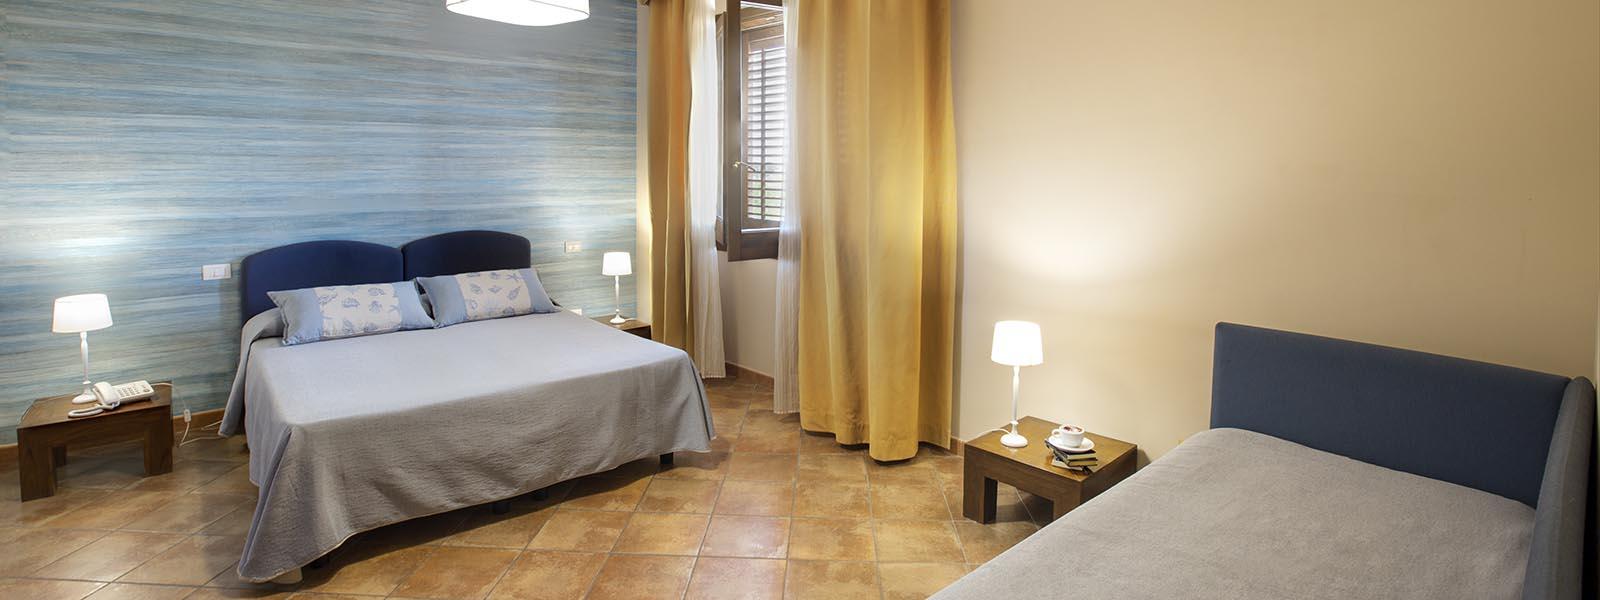 3-star-hotel-favignana-islands-egadi-rooms-04